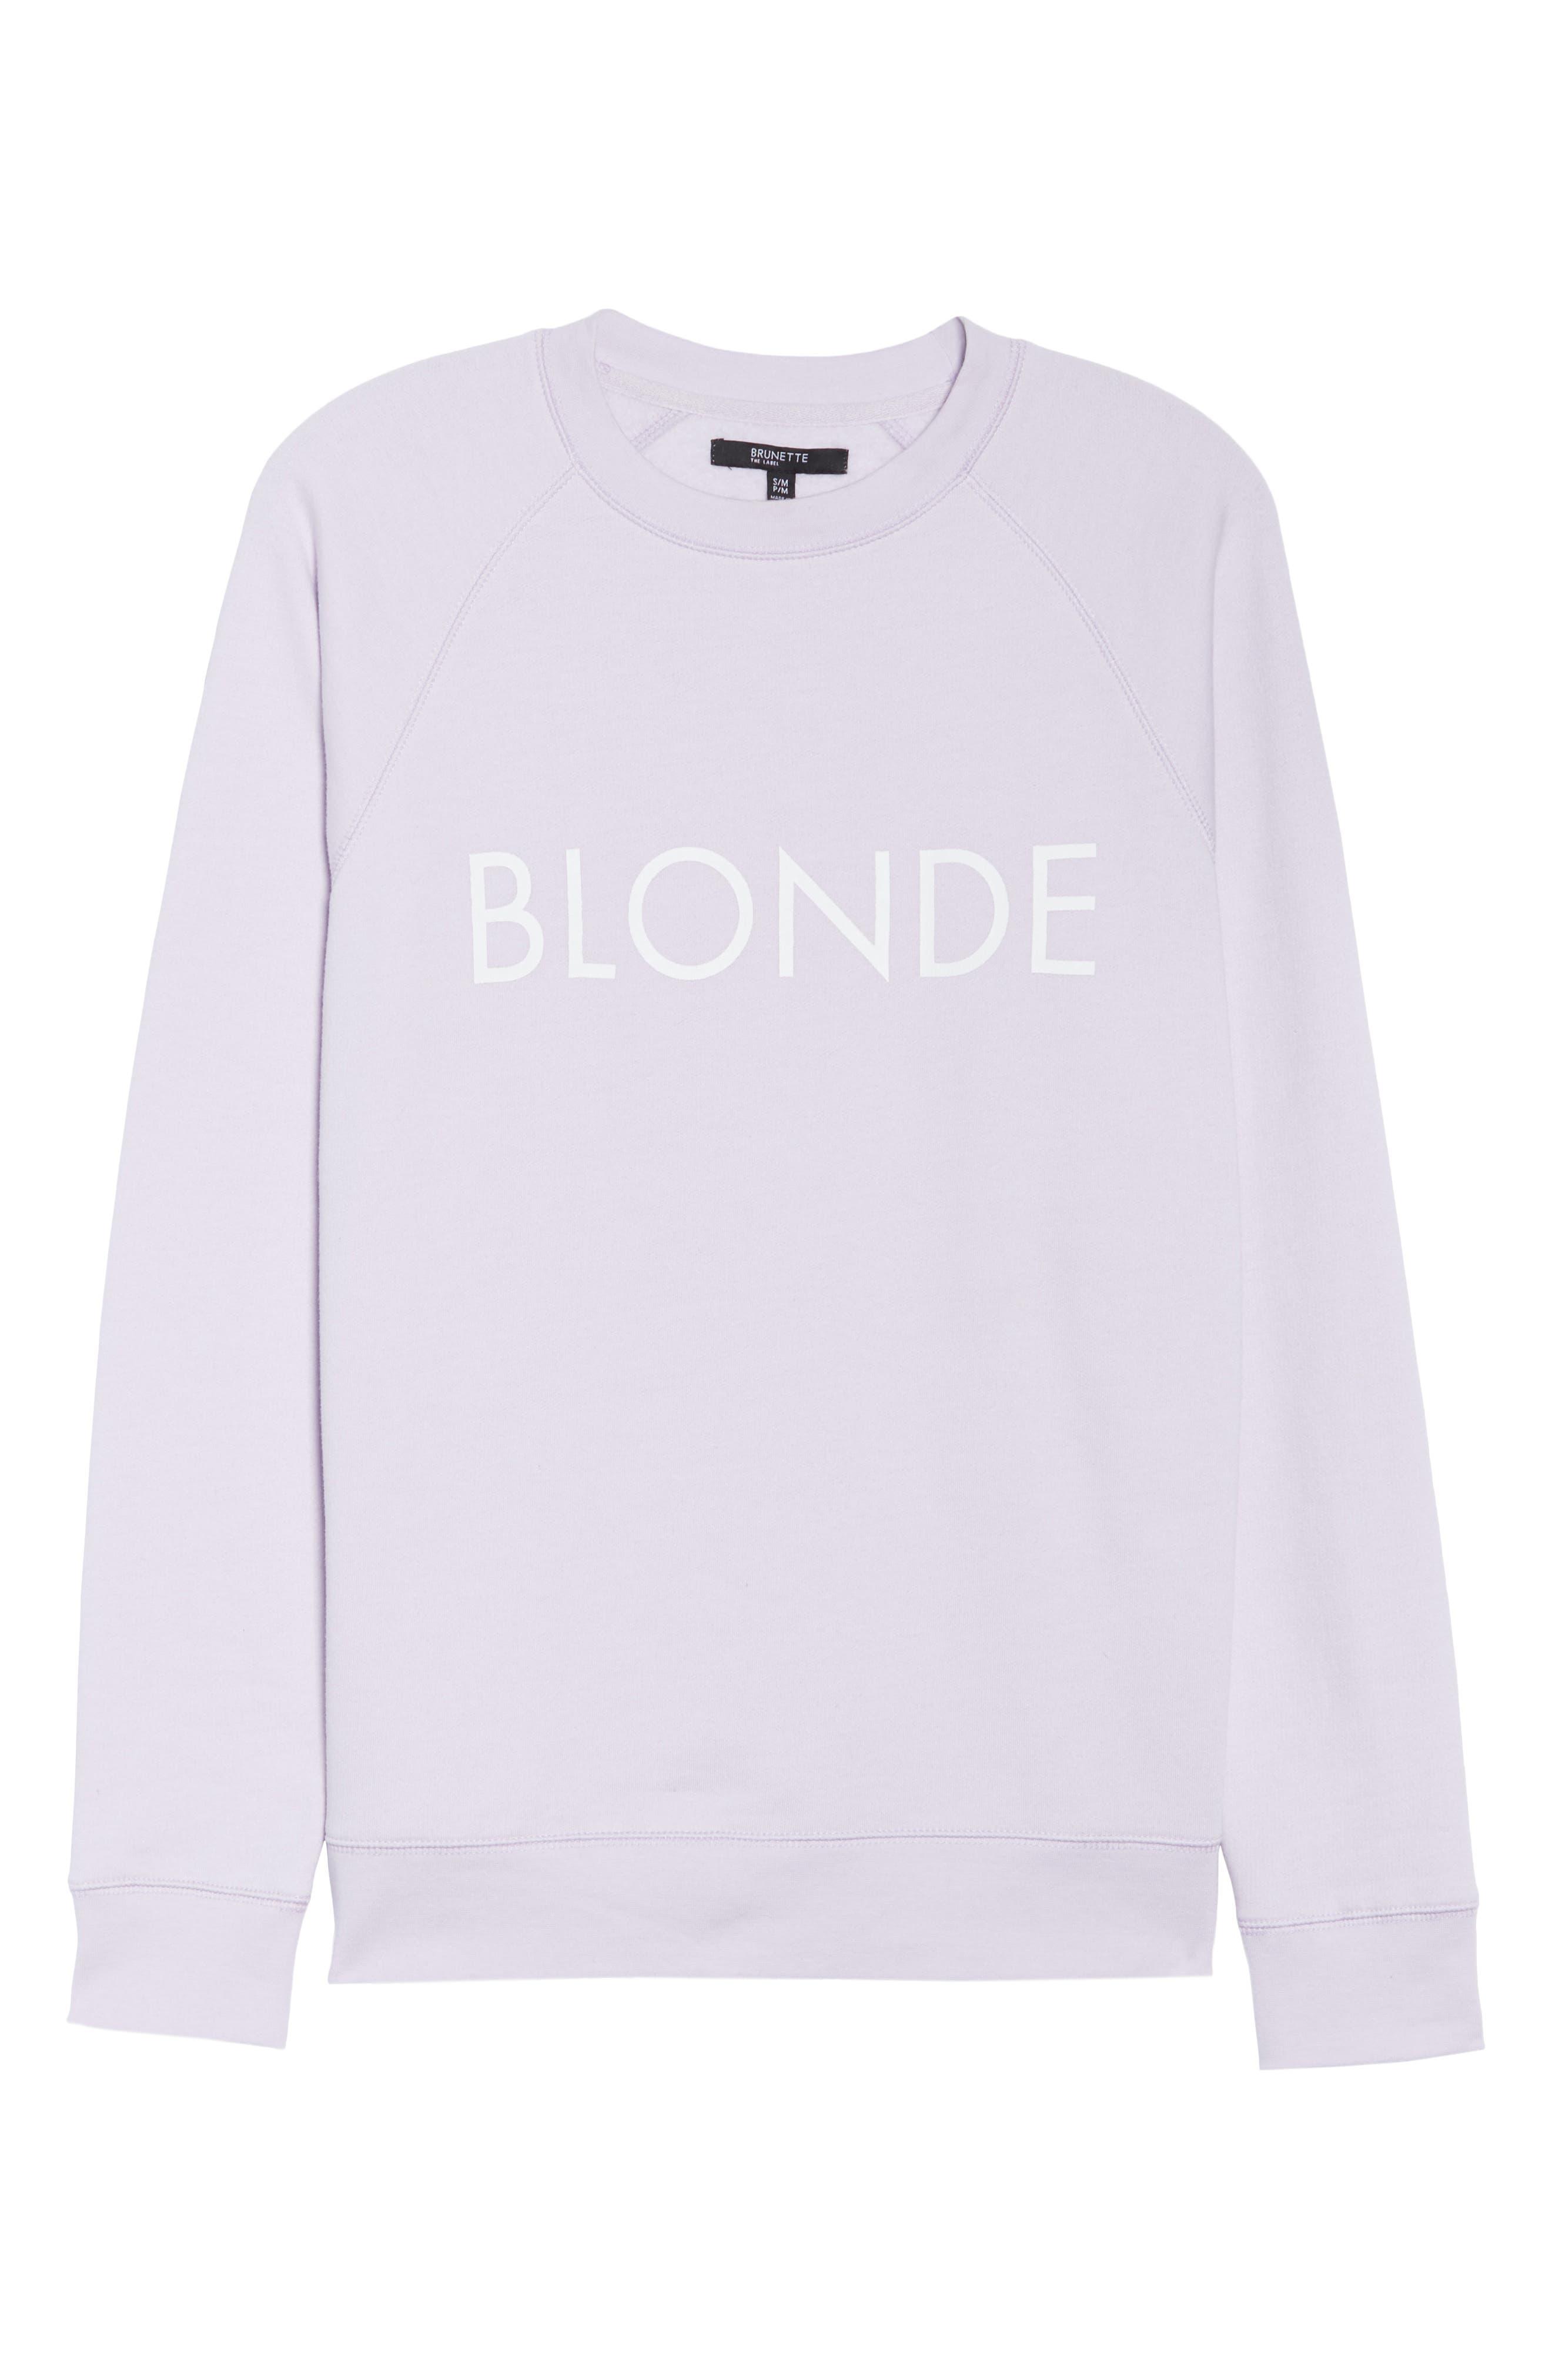 Blonde Sweatshirt,                             Alternate thumbnail 6, color,                             SOFT LAVENDER